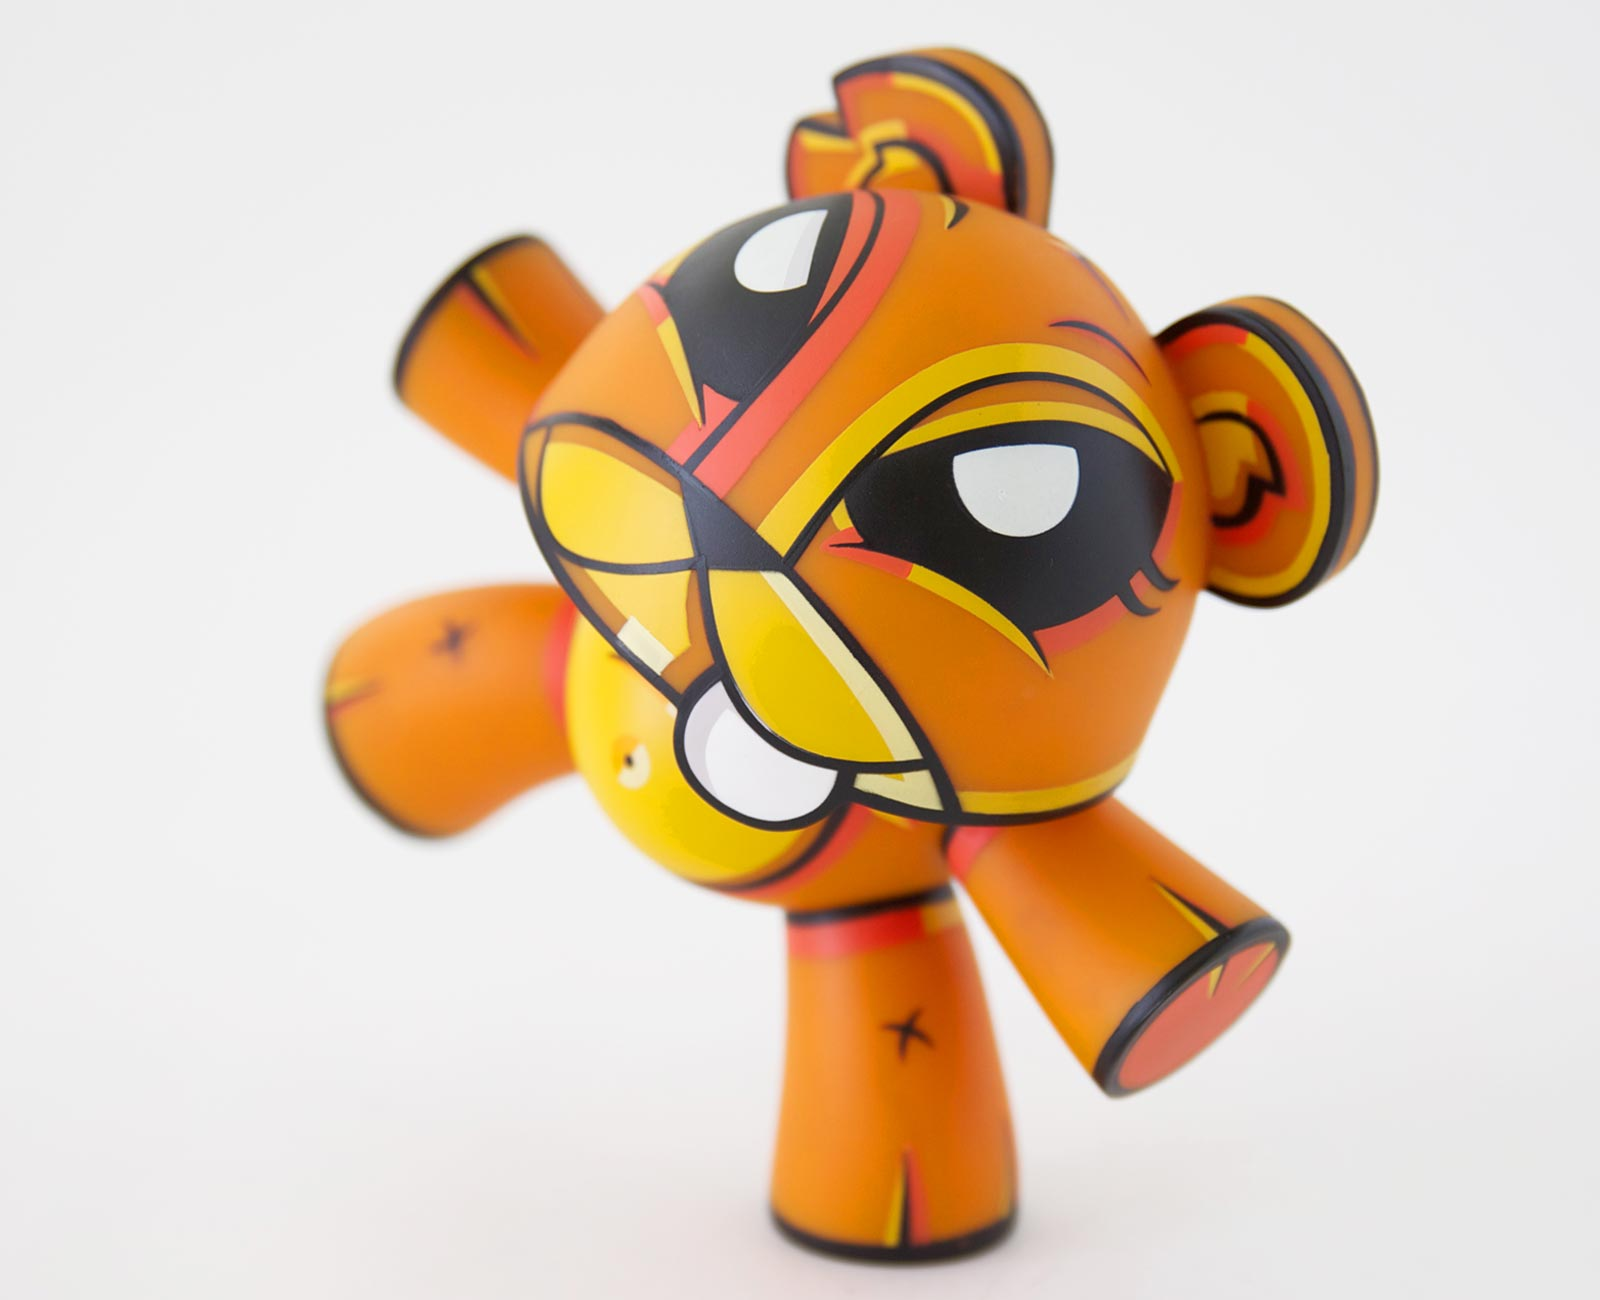 Teeter Orange Art Toy Joe Ledbetter